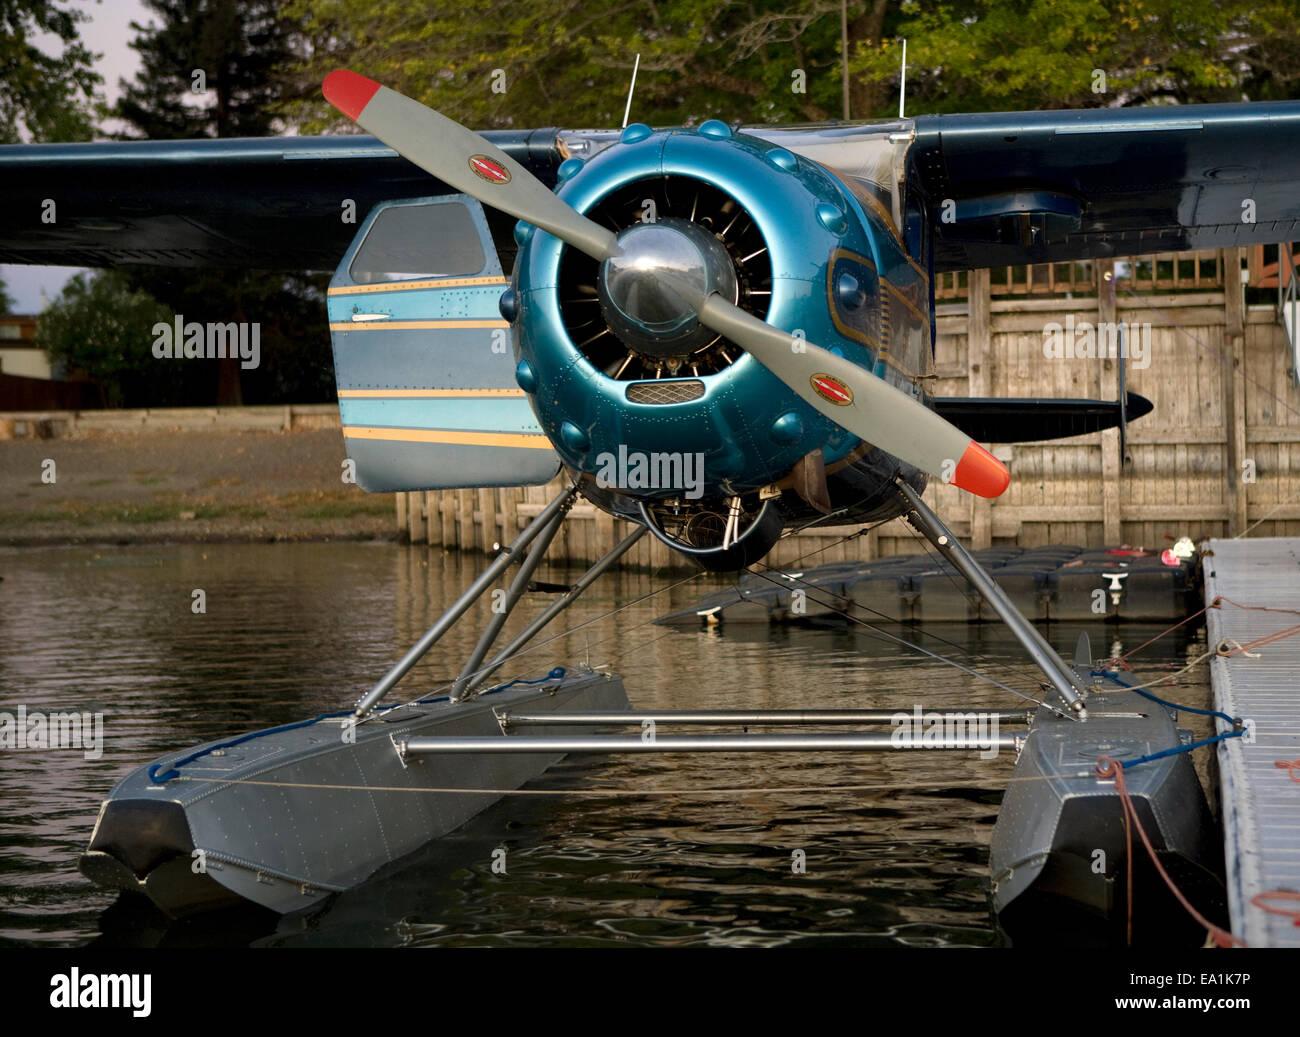 Cessna 195 on floats docked at the Skylark Motel dock, Seaplane Splash-In, Lakeport, California, Lake County, California - Stock Image